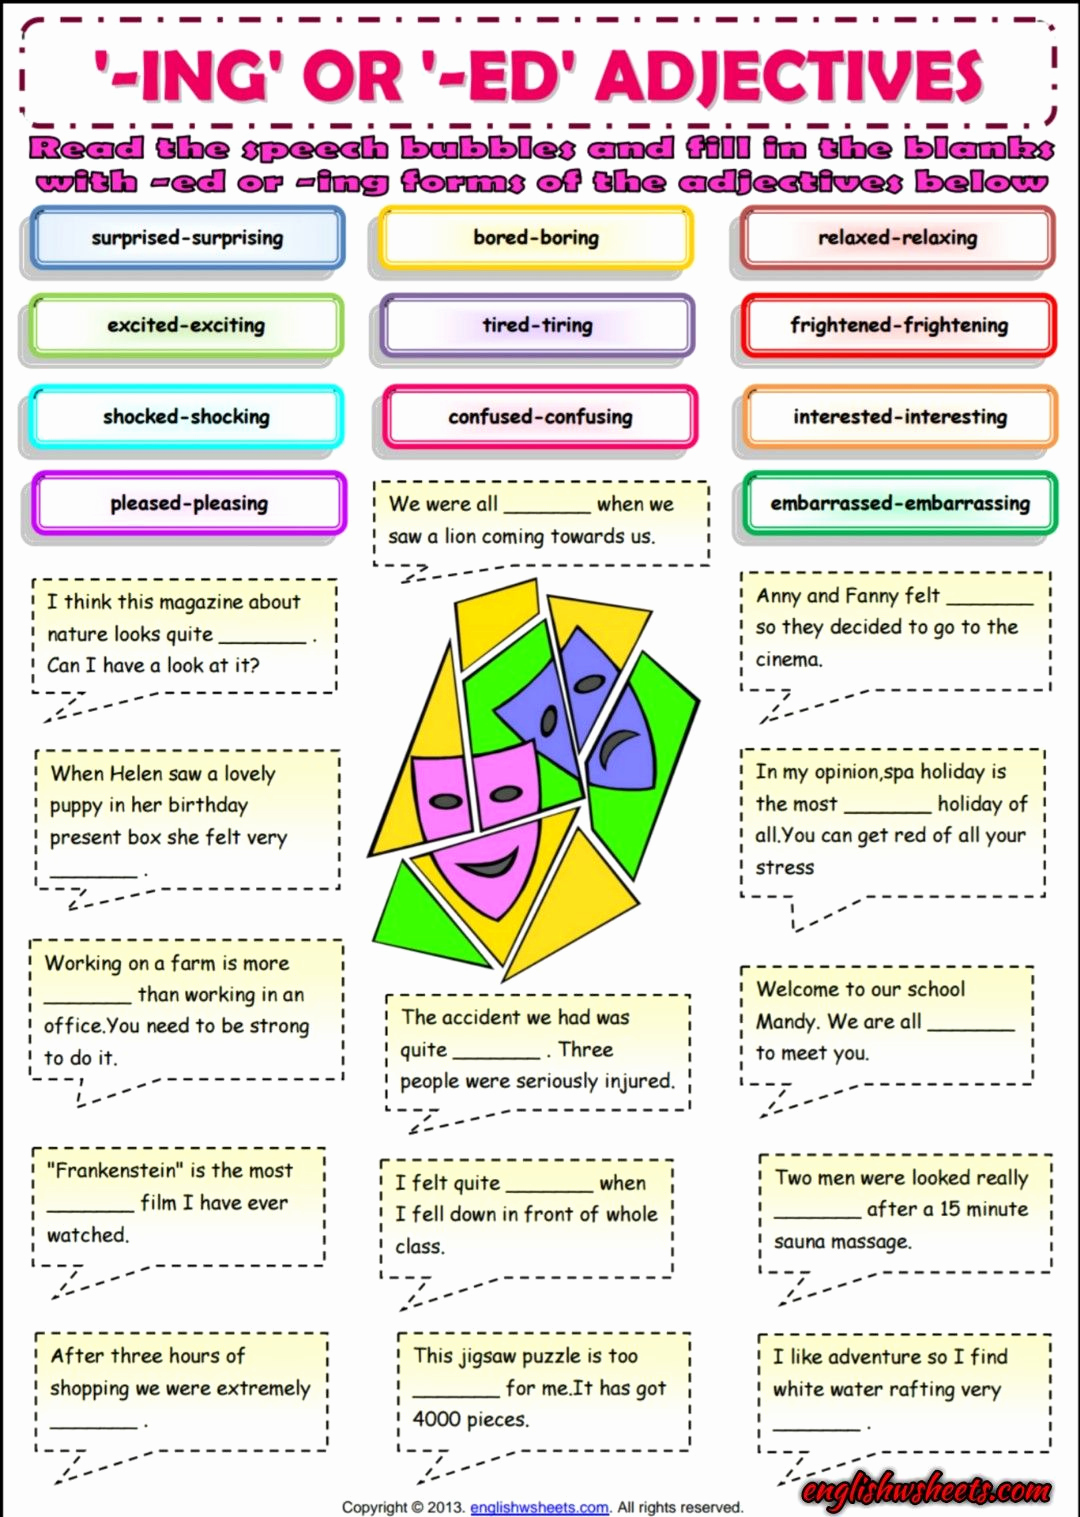 Ed and Ing Worksheets Inspirational Ing or Ed Adjectives Esl Grammar Exercise Worksheet